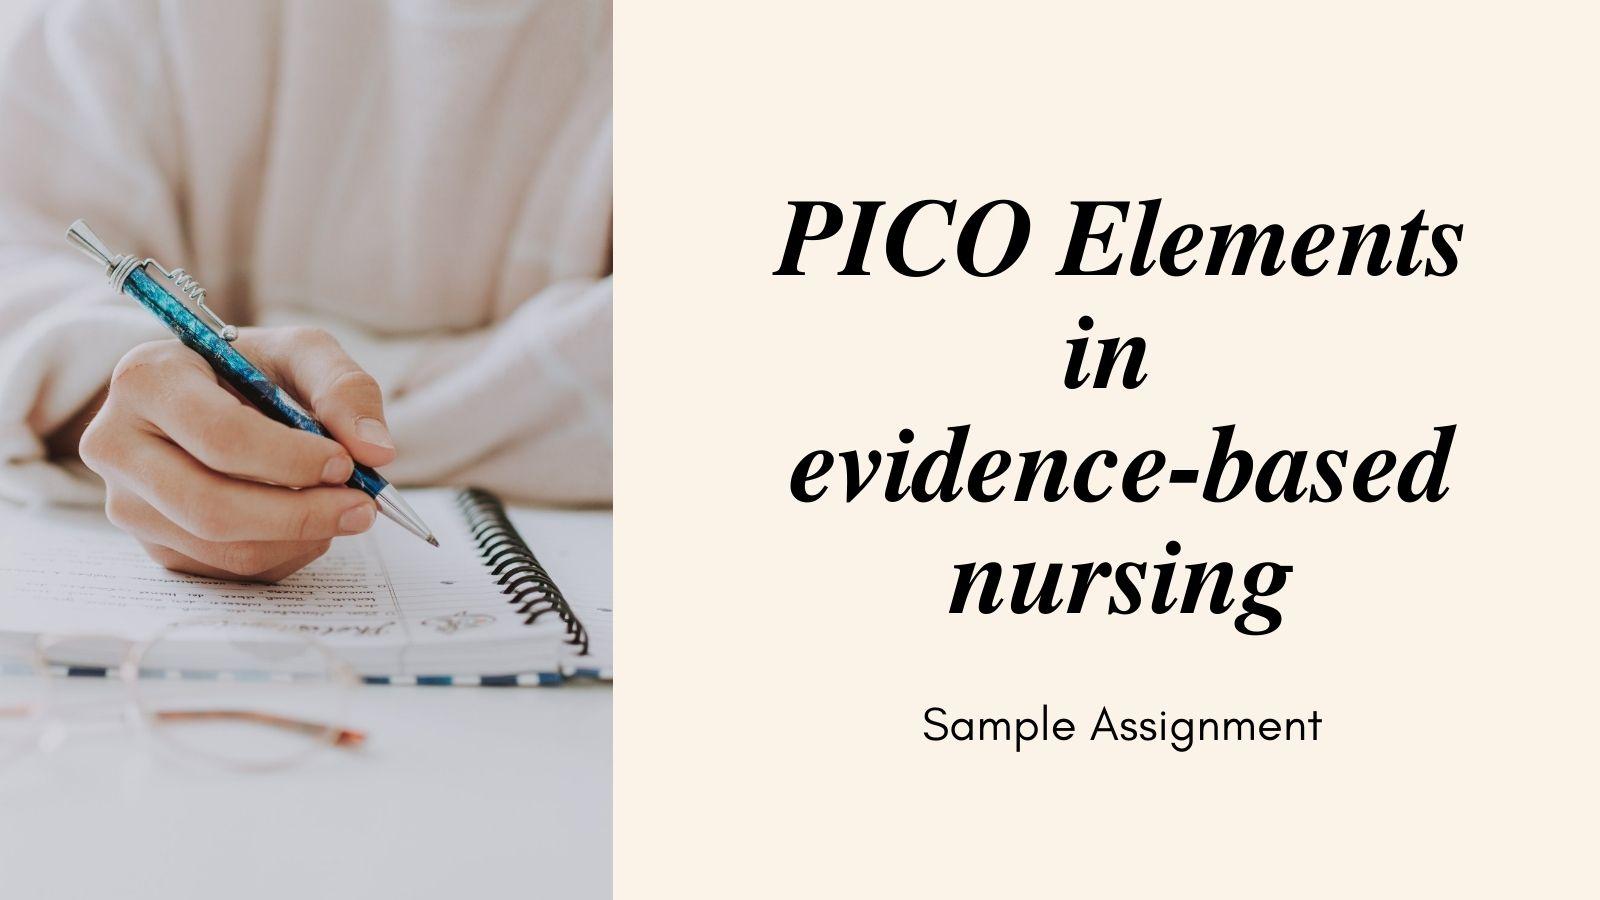 PICO Elements in evidence-based nursing